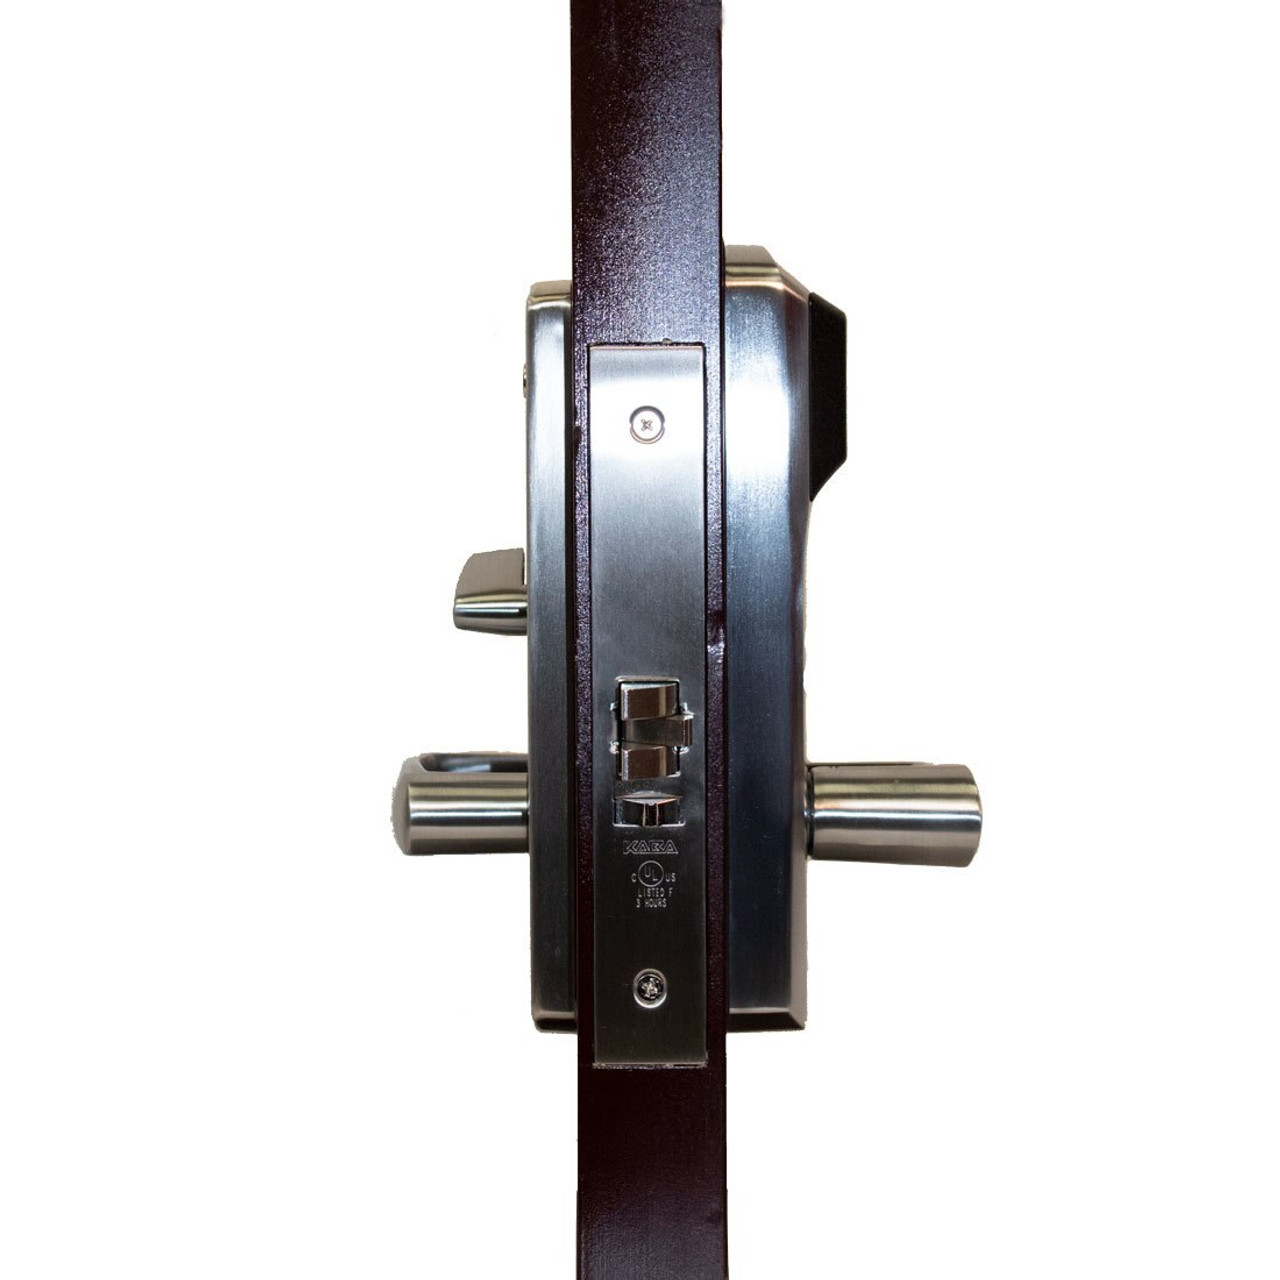 SAFLOK ILCO 79/790/RT BLUETOOTH DOOR LOCK